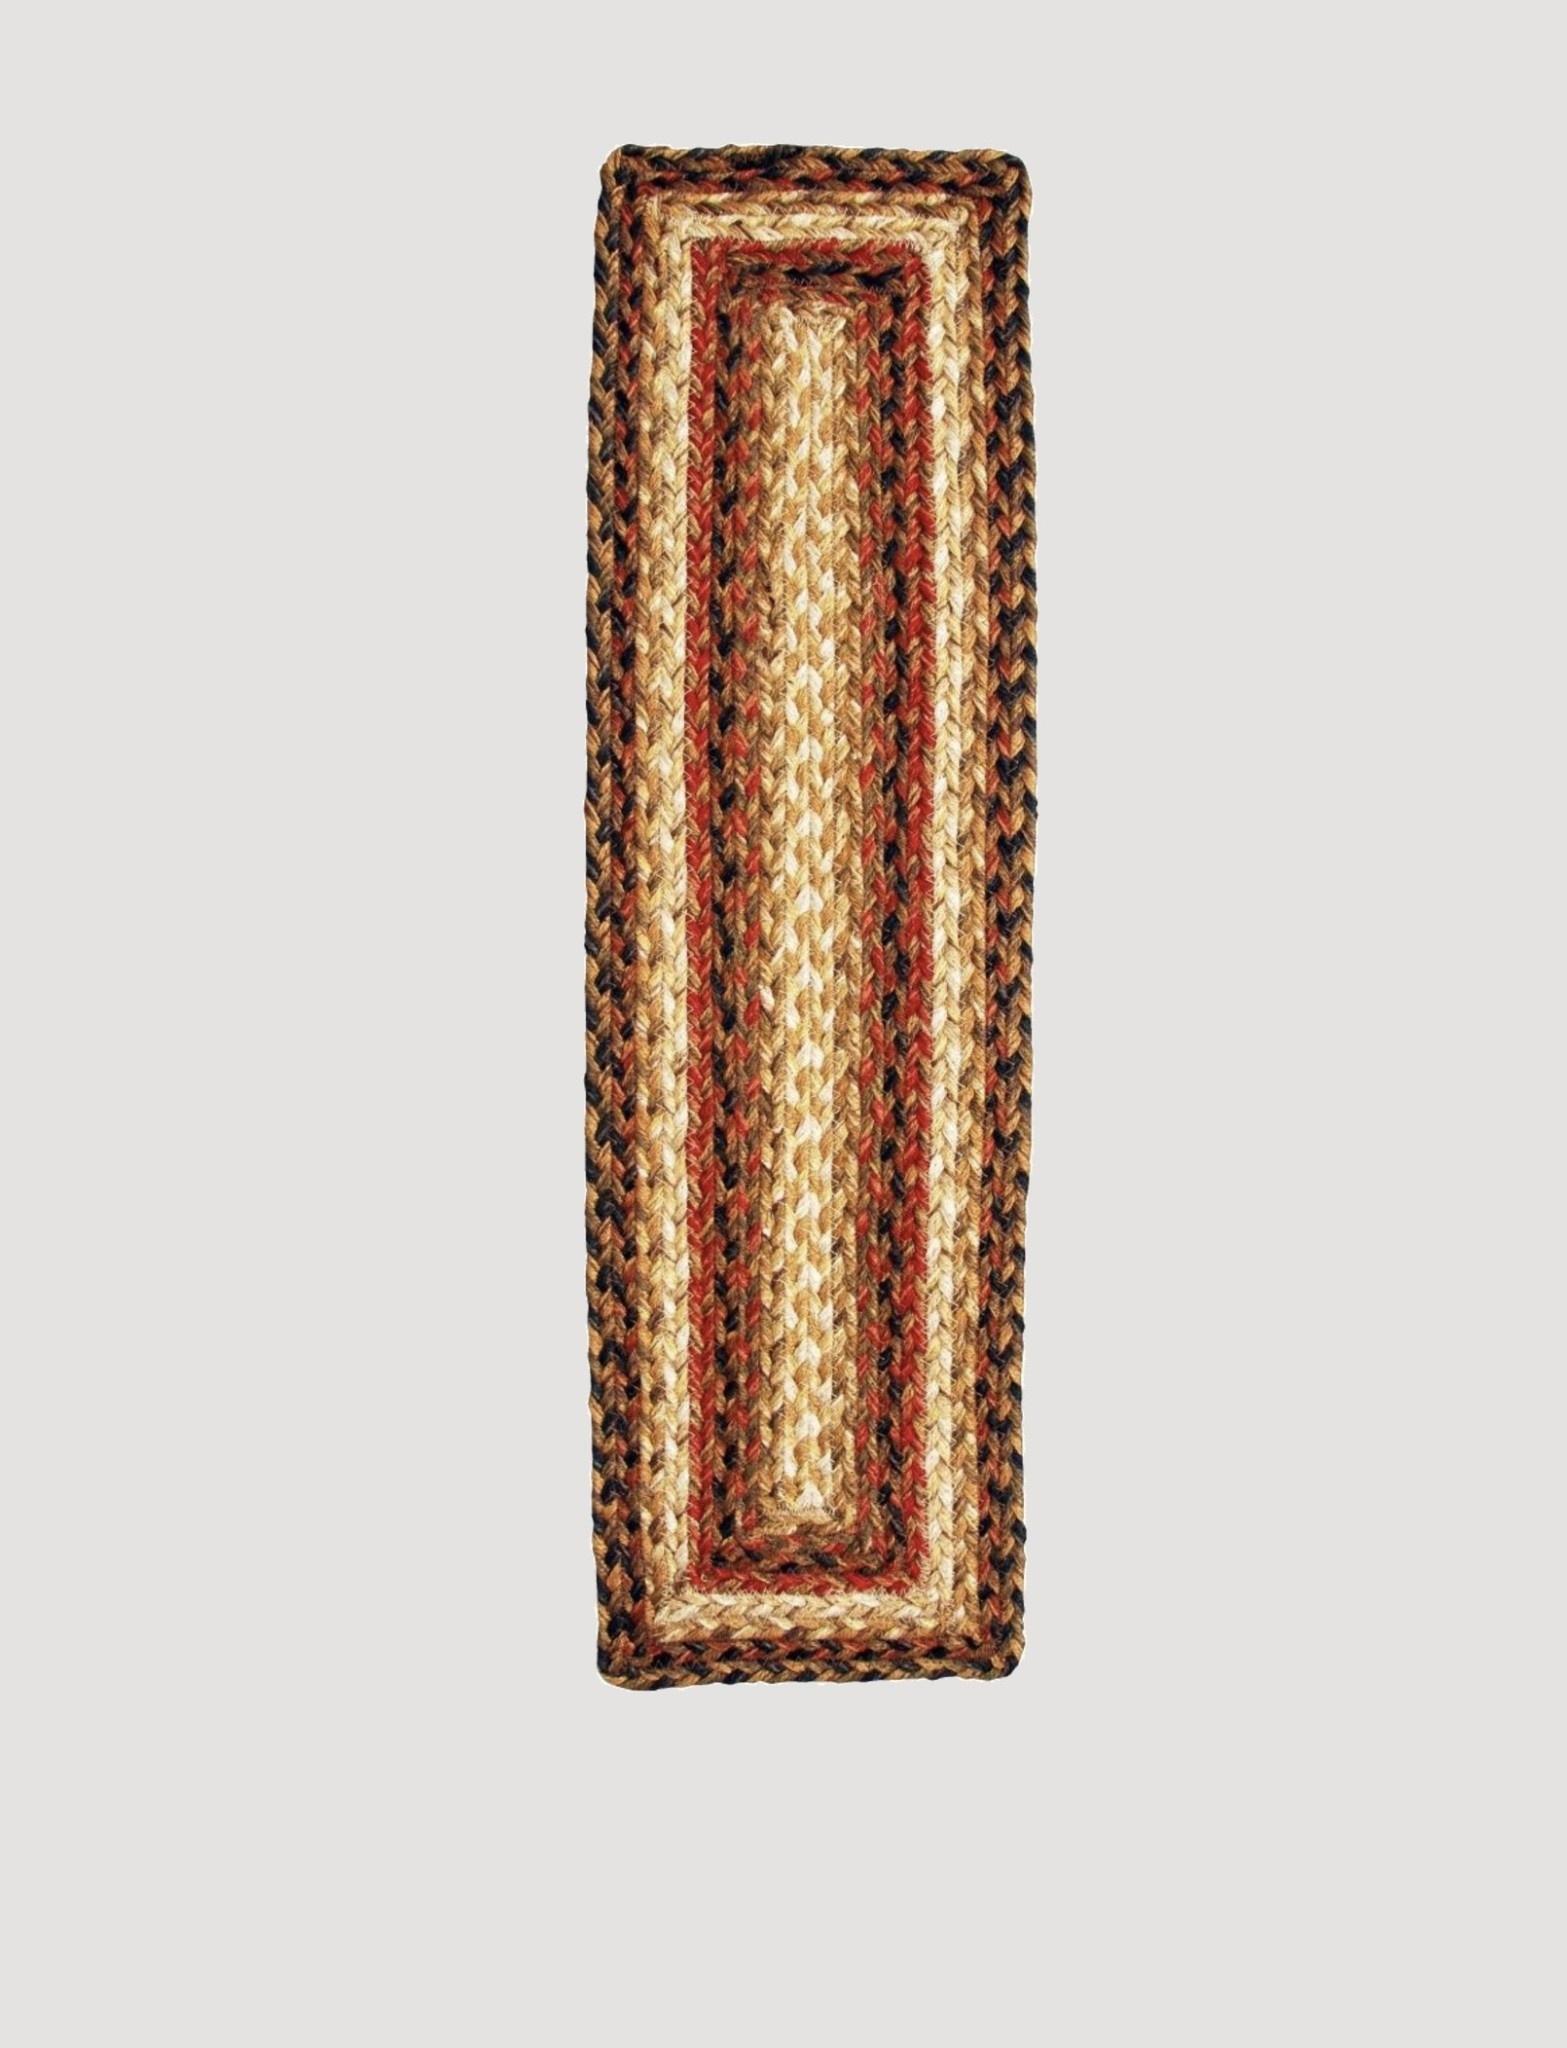 Homespice Decor Russett Jute Braided TableTop Accessories